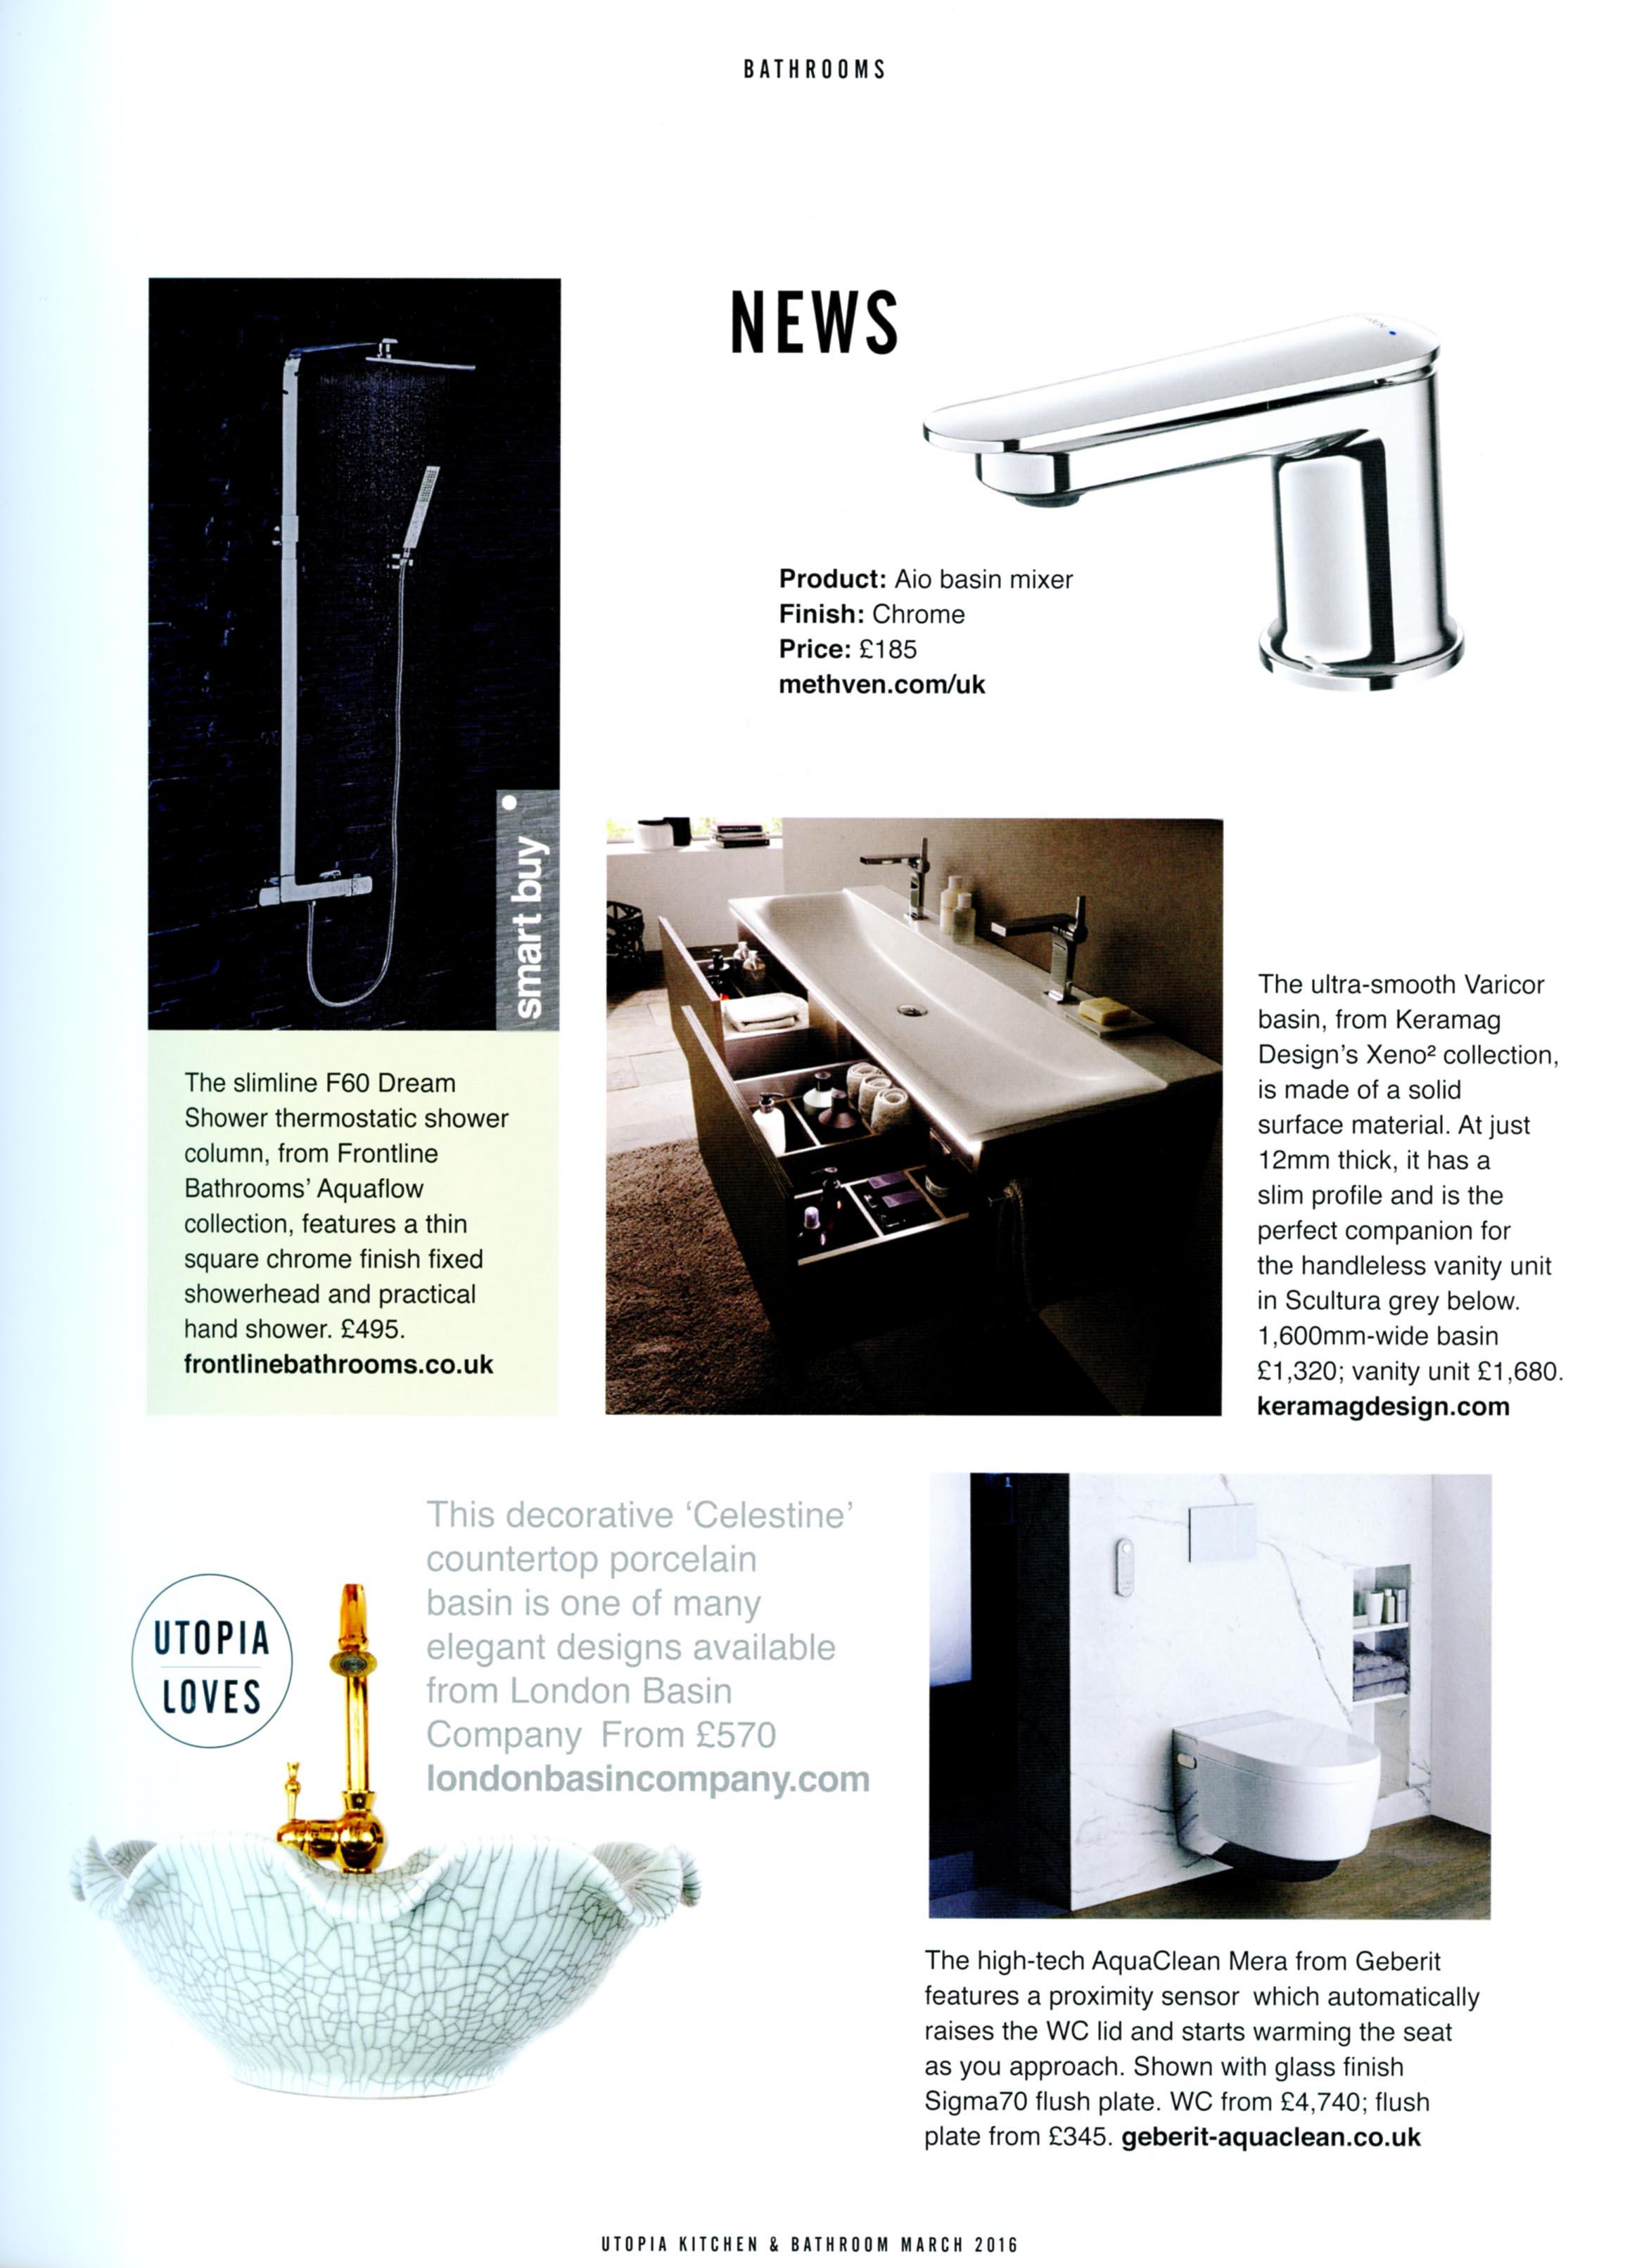 Utopia Kitchen & Bathroom March 2016 LBC.jpg